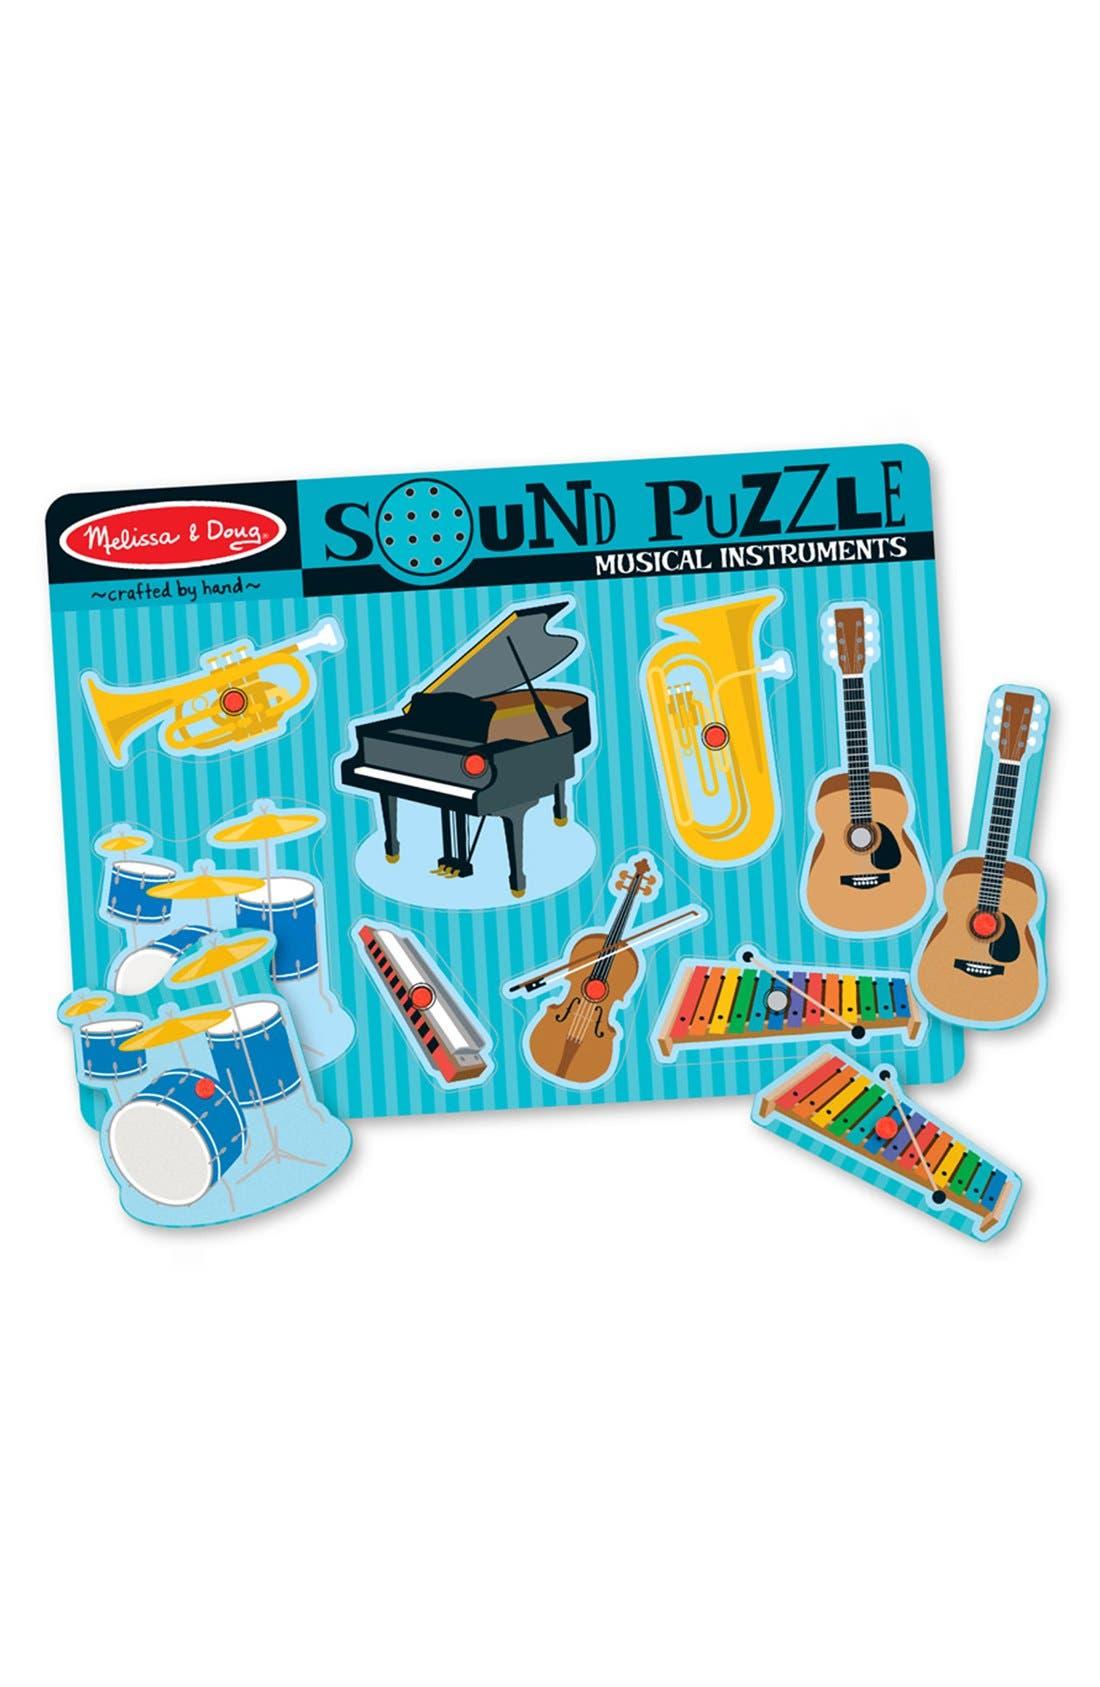 Alternate Image 1 Selected - Melissa & Doug 'Musical Instruments' Sound Puzzle